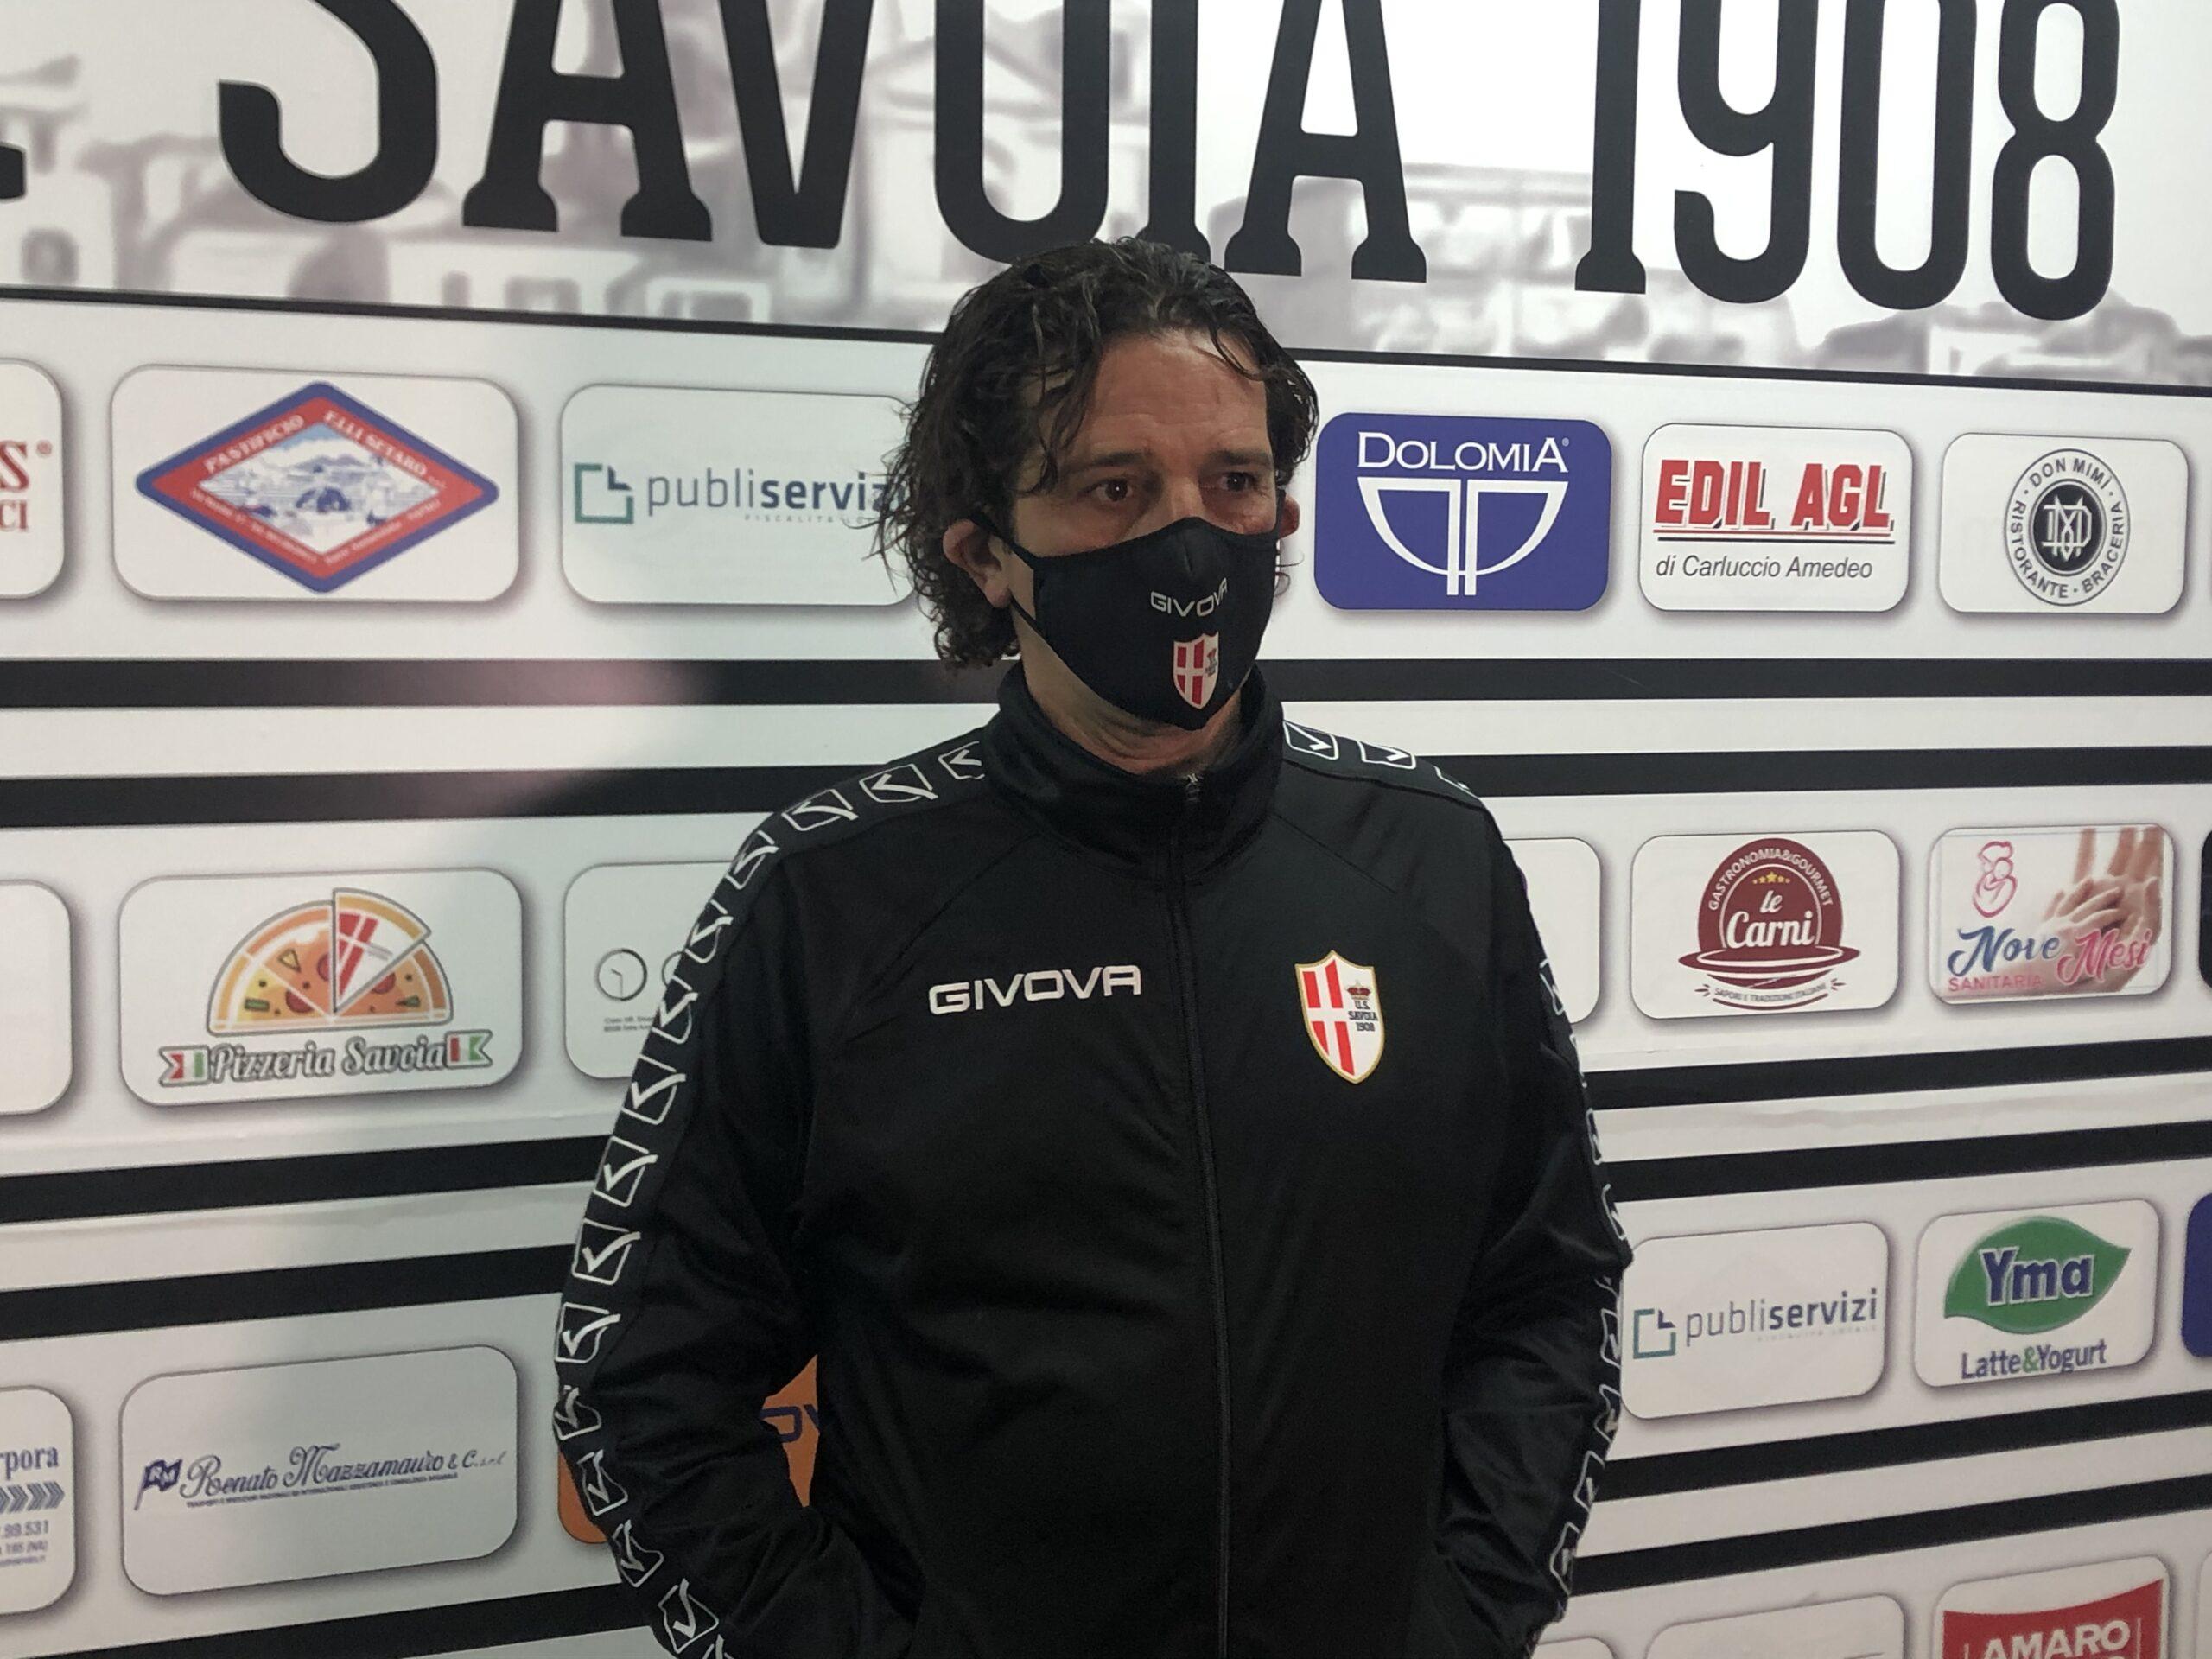 Giovanni Ferraro Savoia